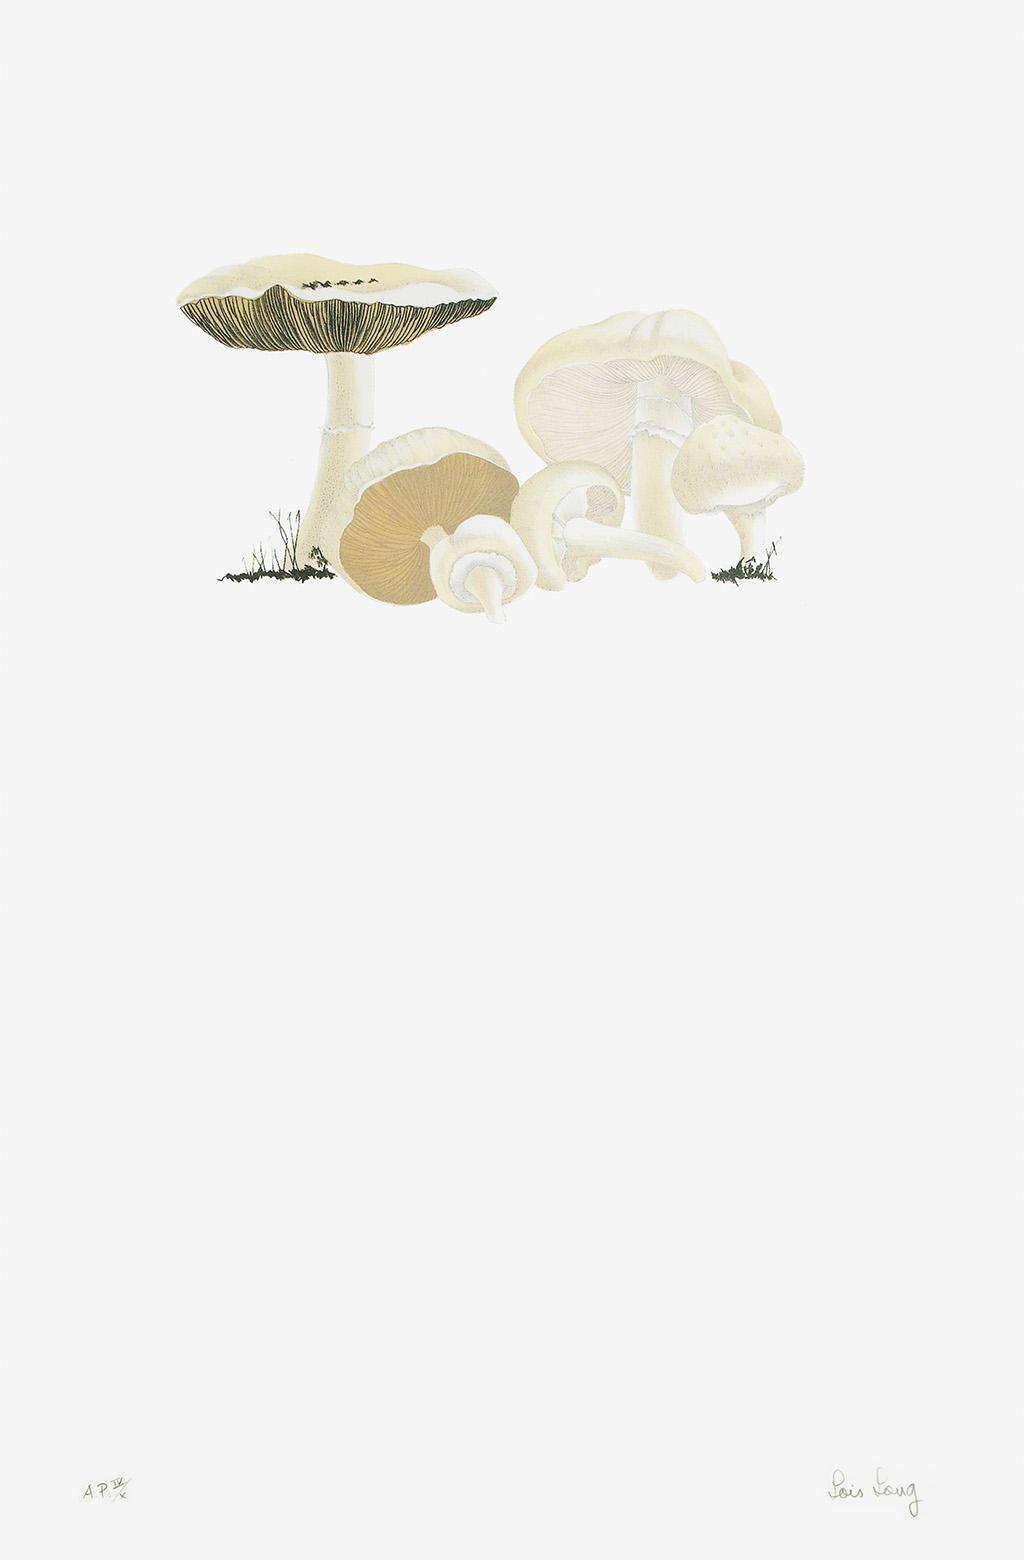 CAGE, JOHN; LONG, LOIS, and SMITH, ALEXANDER. The Mushroom Book.